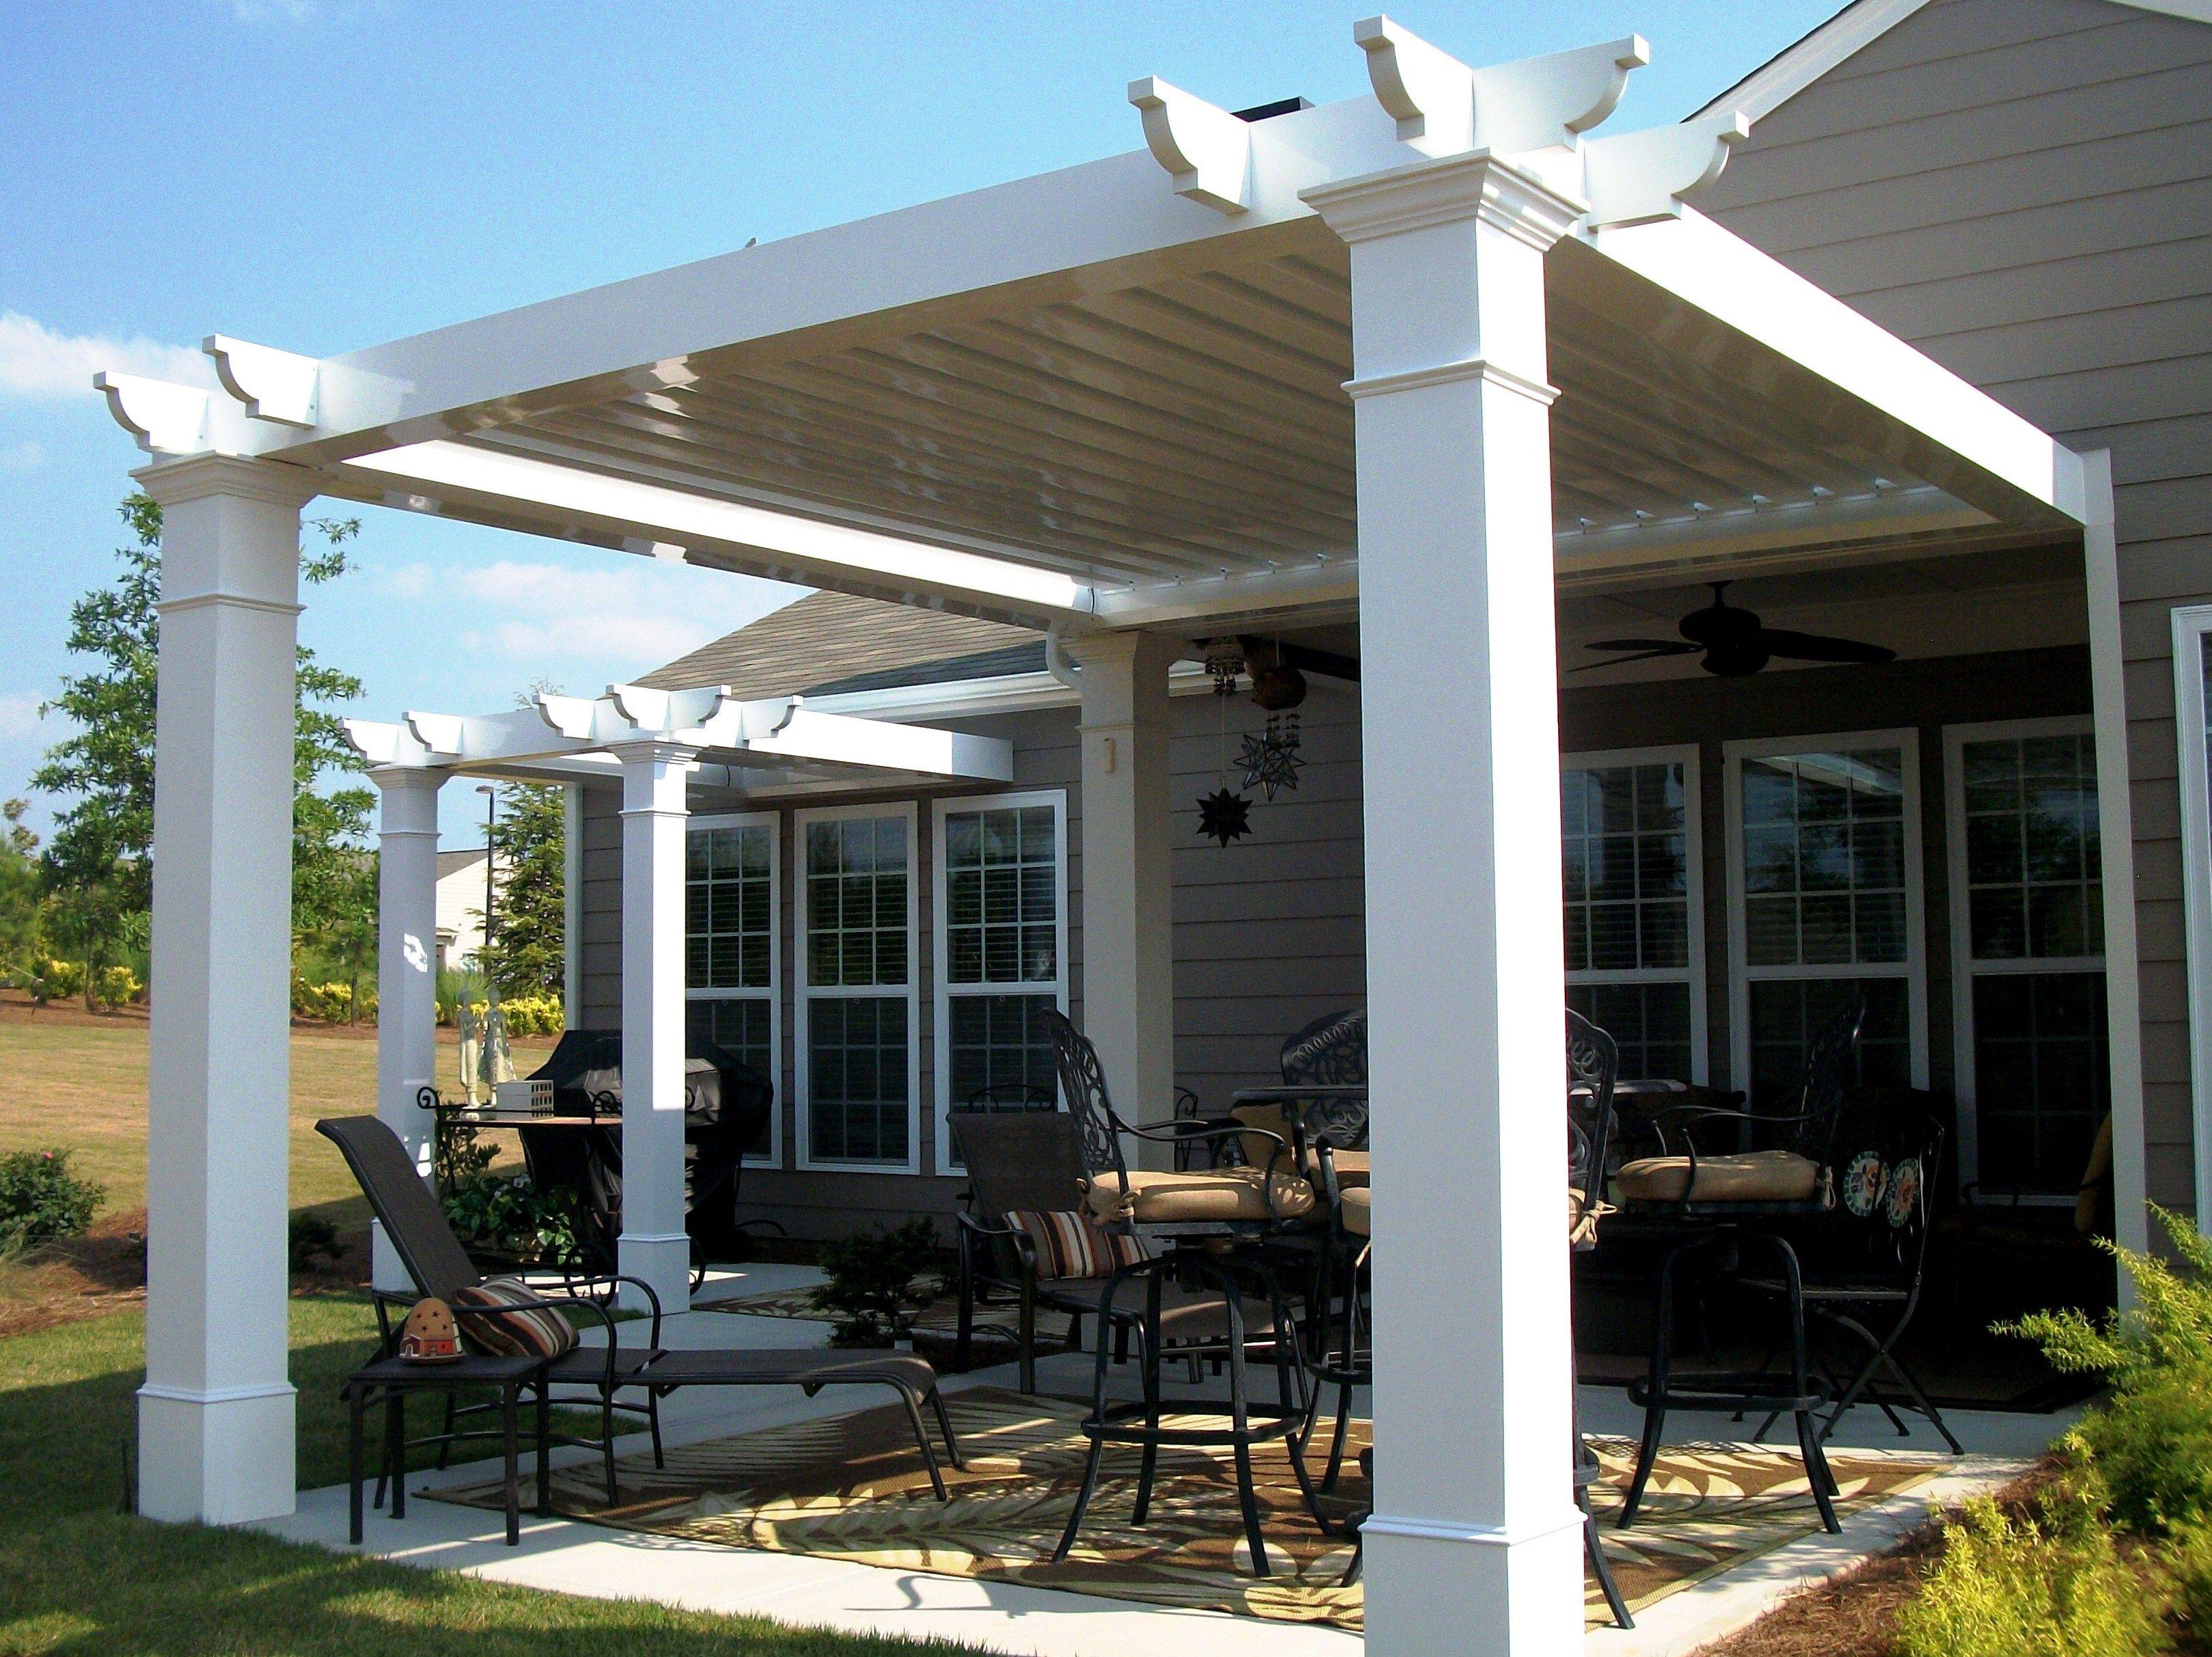 Adjustable Pergola Outdoor Kitchens Screen Enclosures Sunrooms Absolute Aluminum Sarasota Venice Pergola Designs Outdoor Pergola Pergola